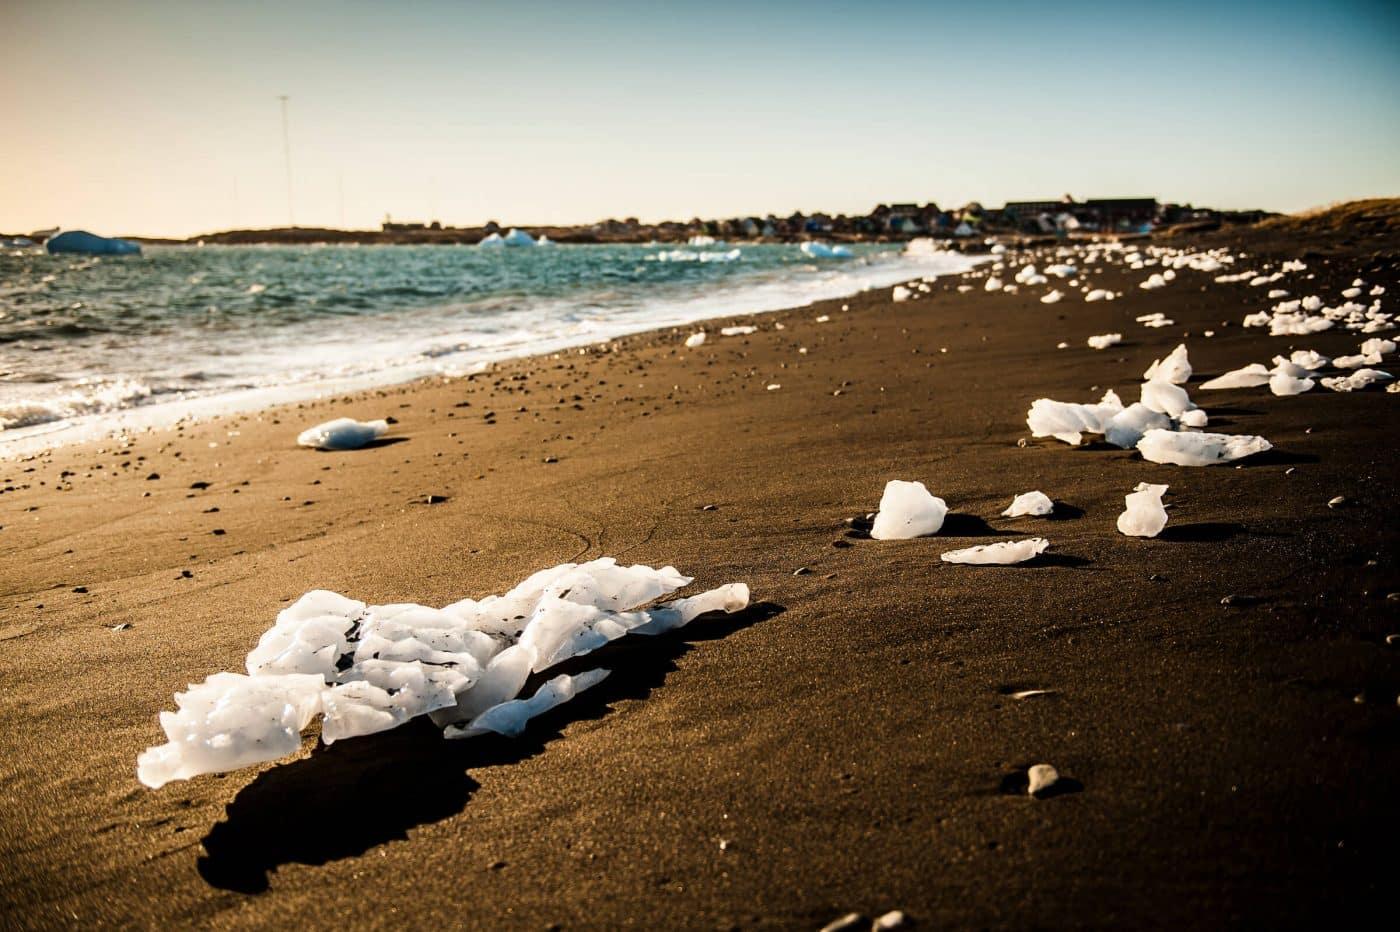 The beach near Qeqertarsuaq town in the Disko Bay in Greenland. Photo by Camilla Hylleberg